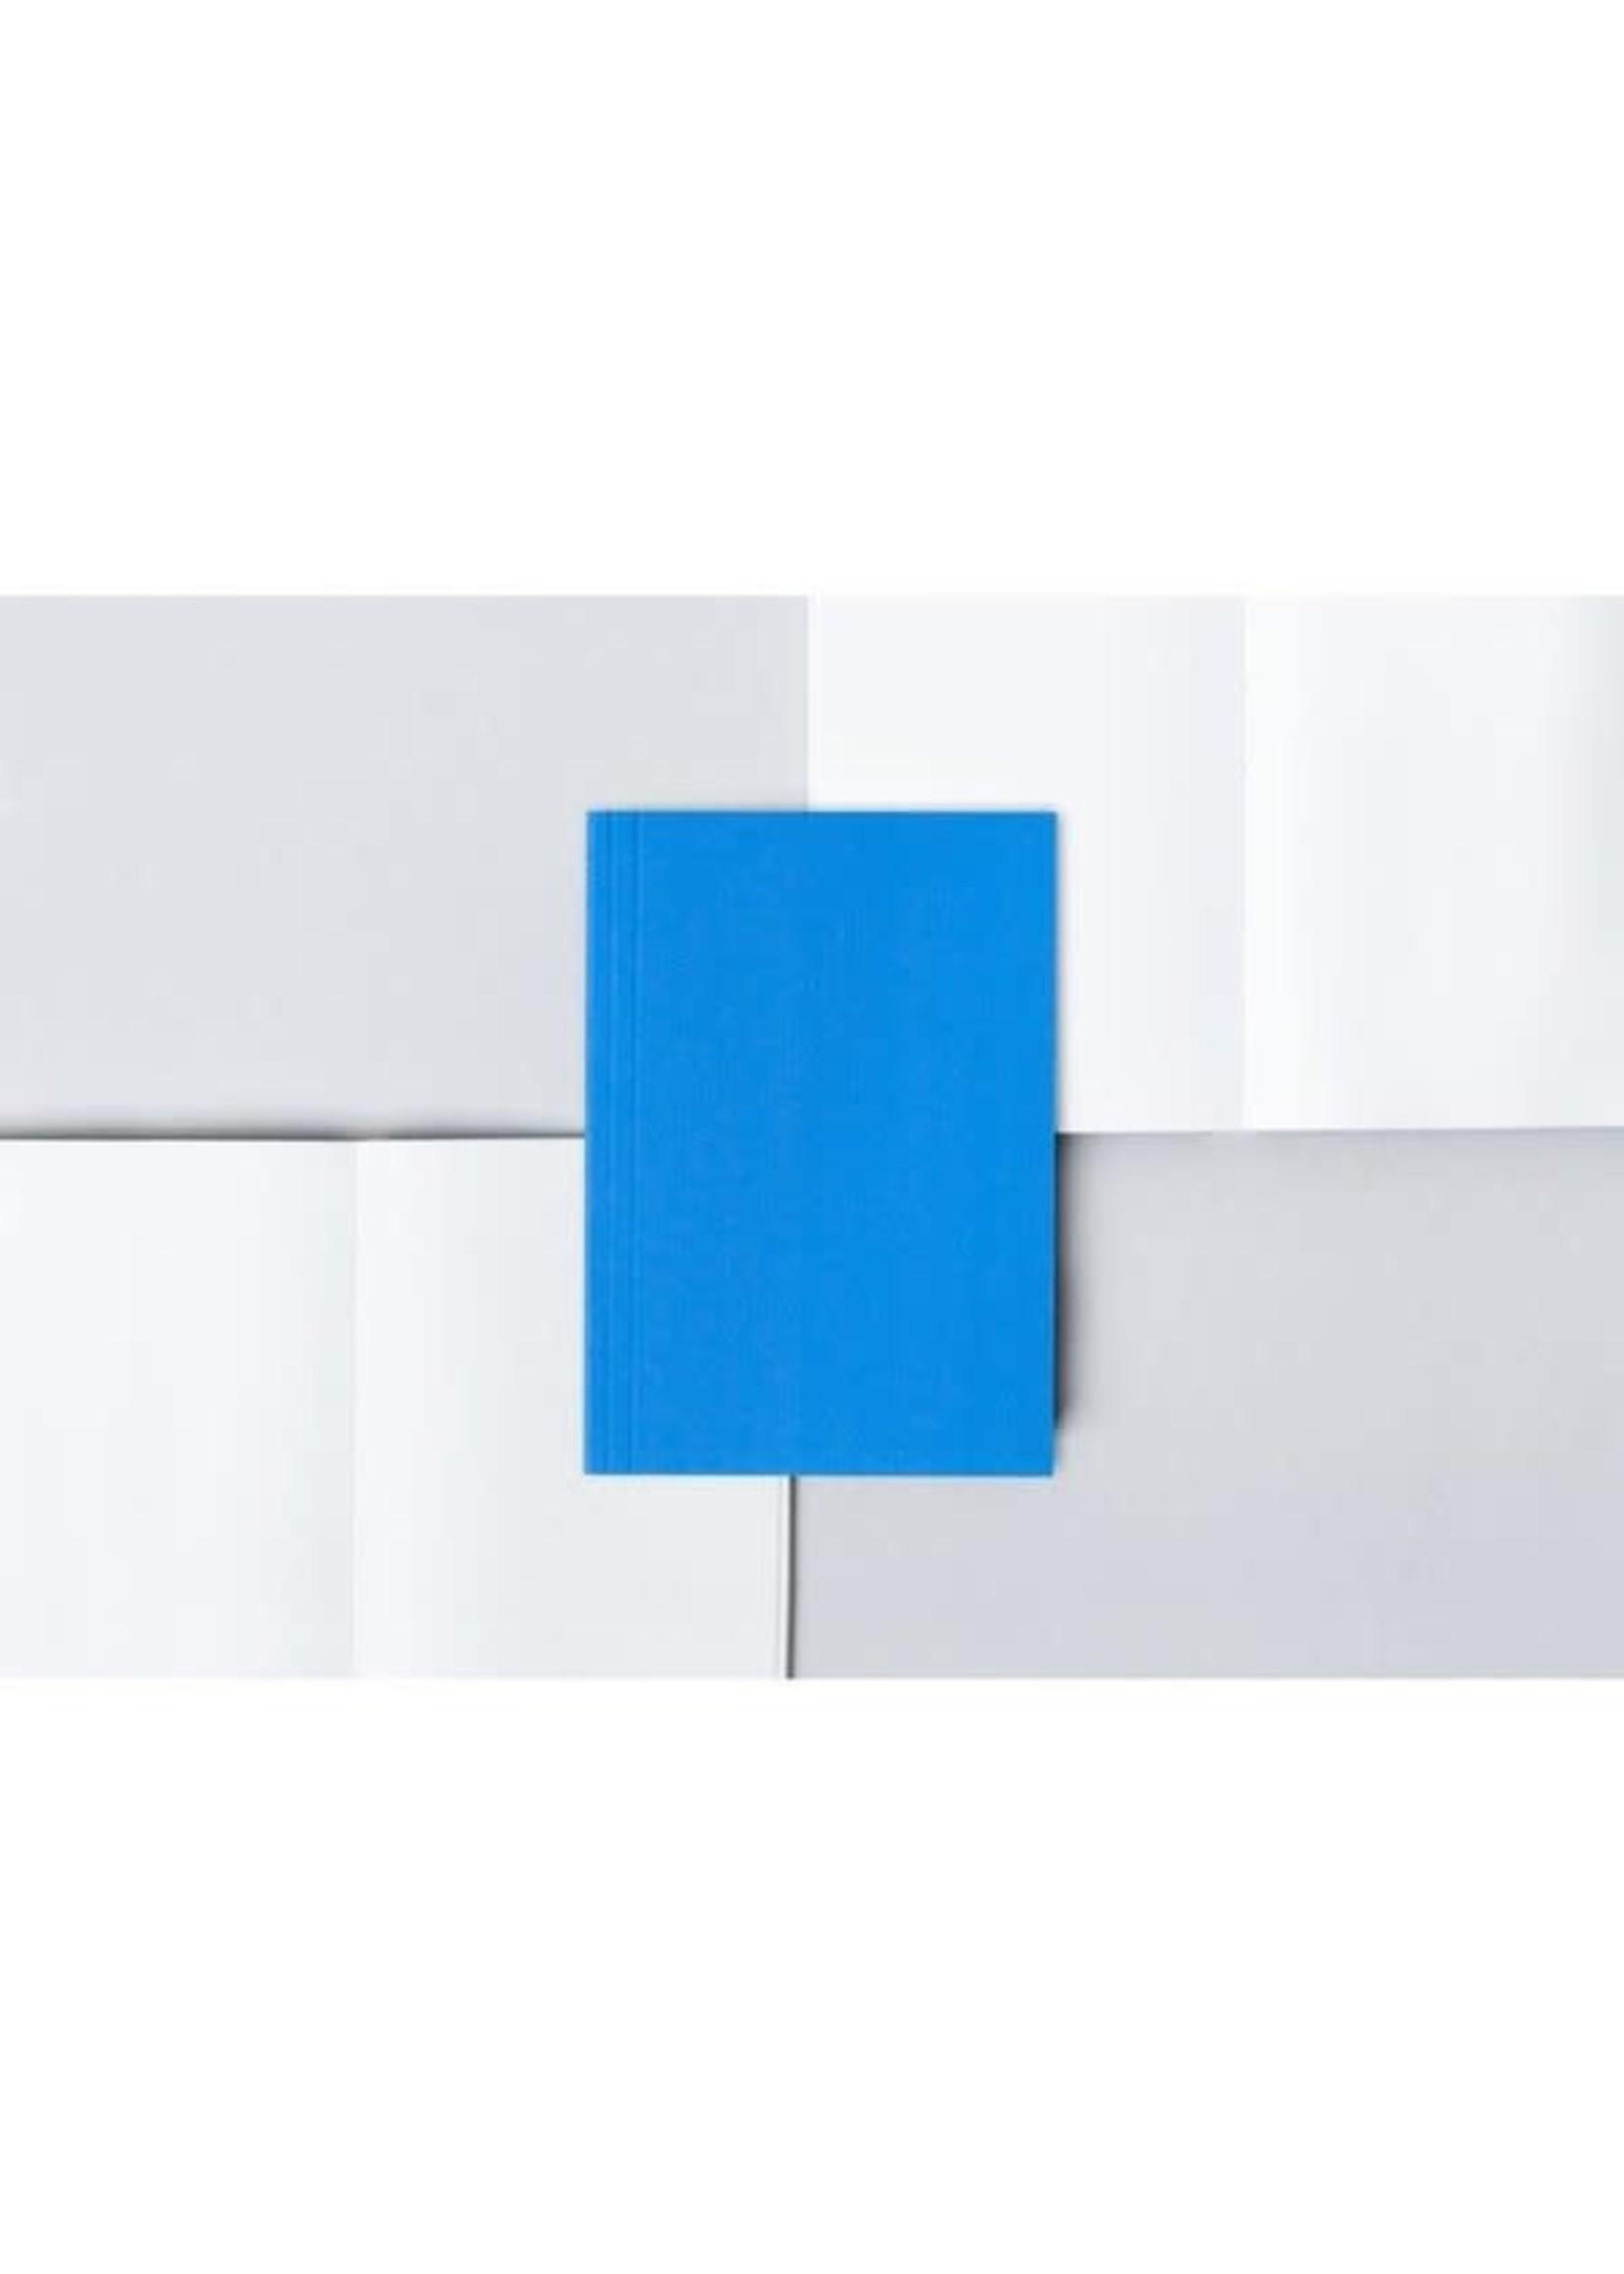 Ola Ola Pocket Layflat Notebook: Everyday Objects Edition 2: Circle Blue/Plain Pages